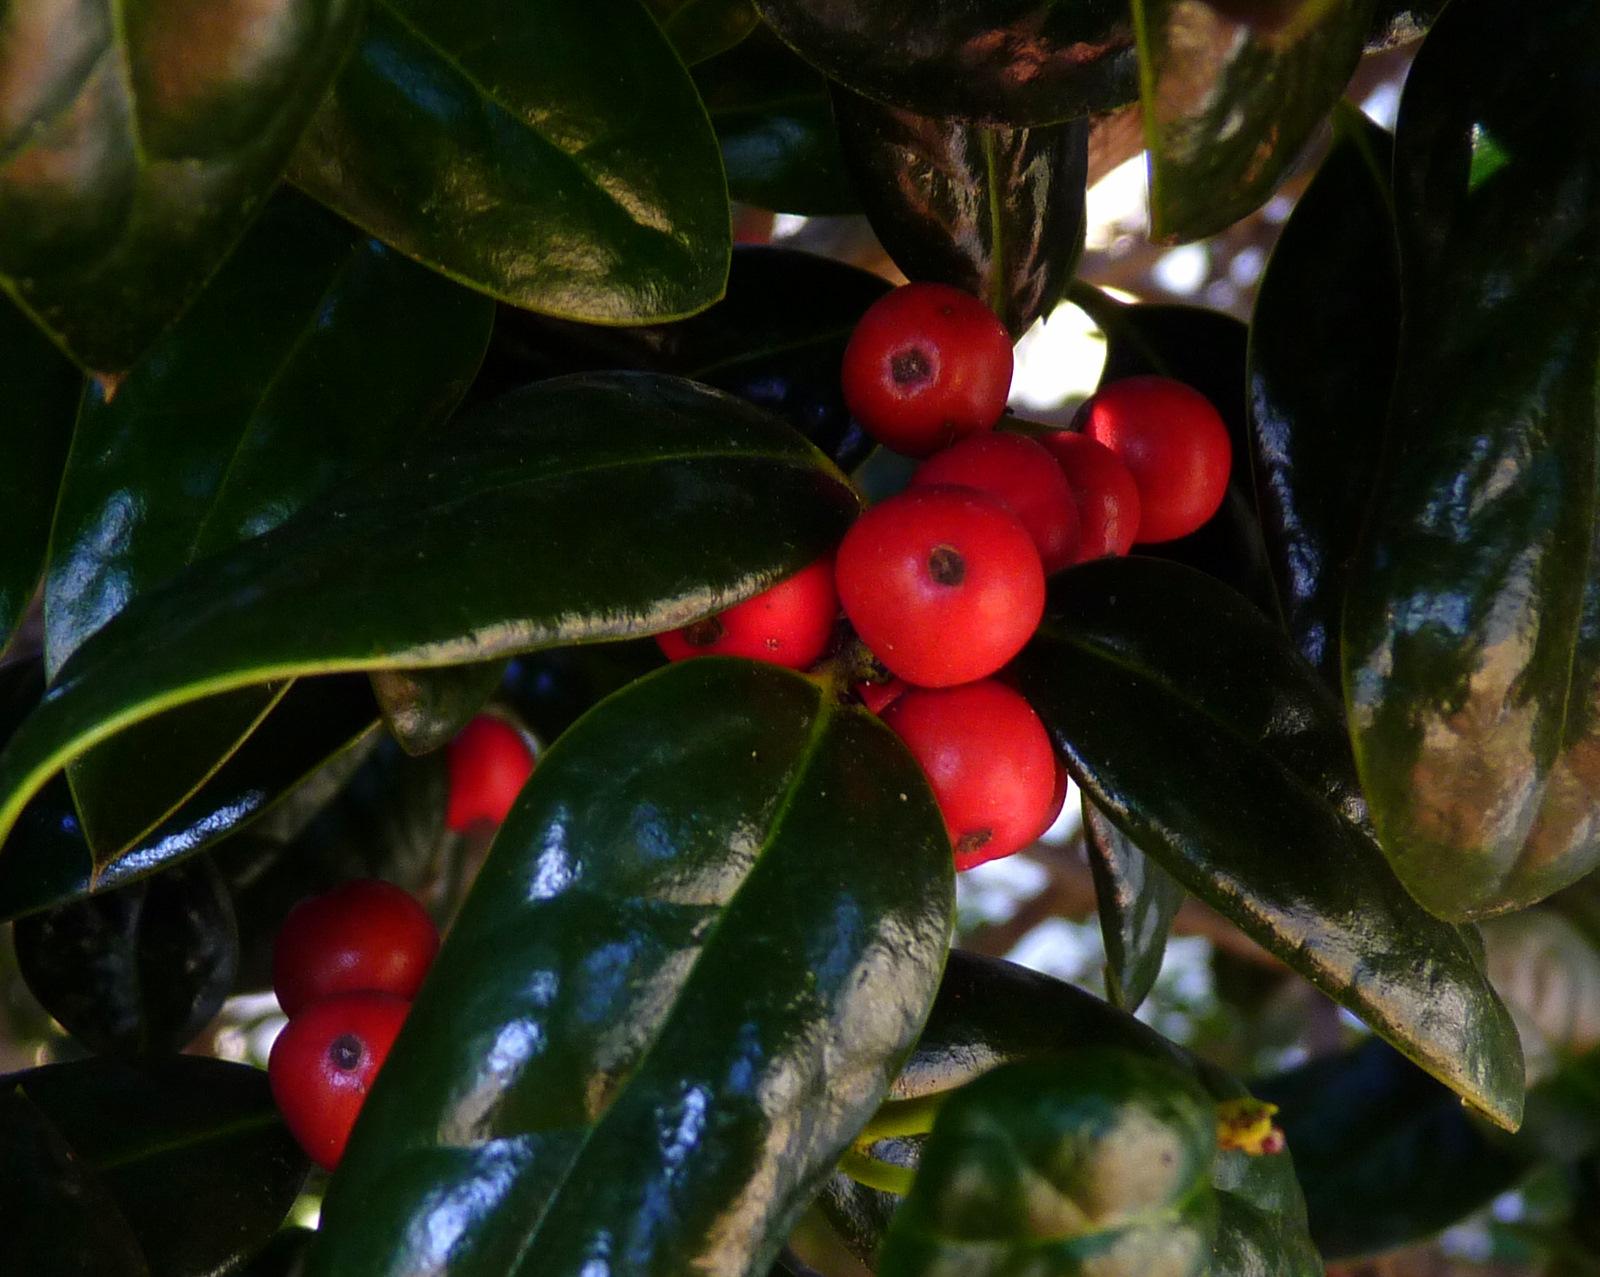 My Florida Backyard Holly Leaves And Christmas Trees